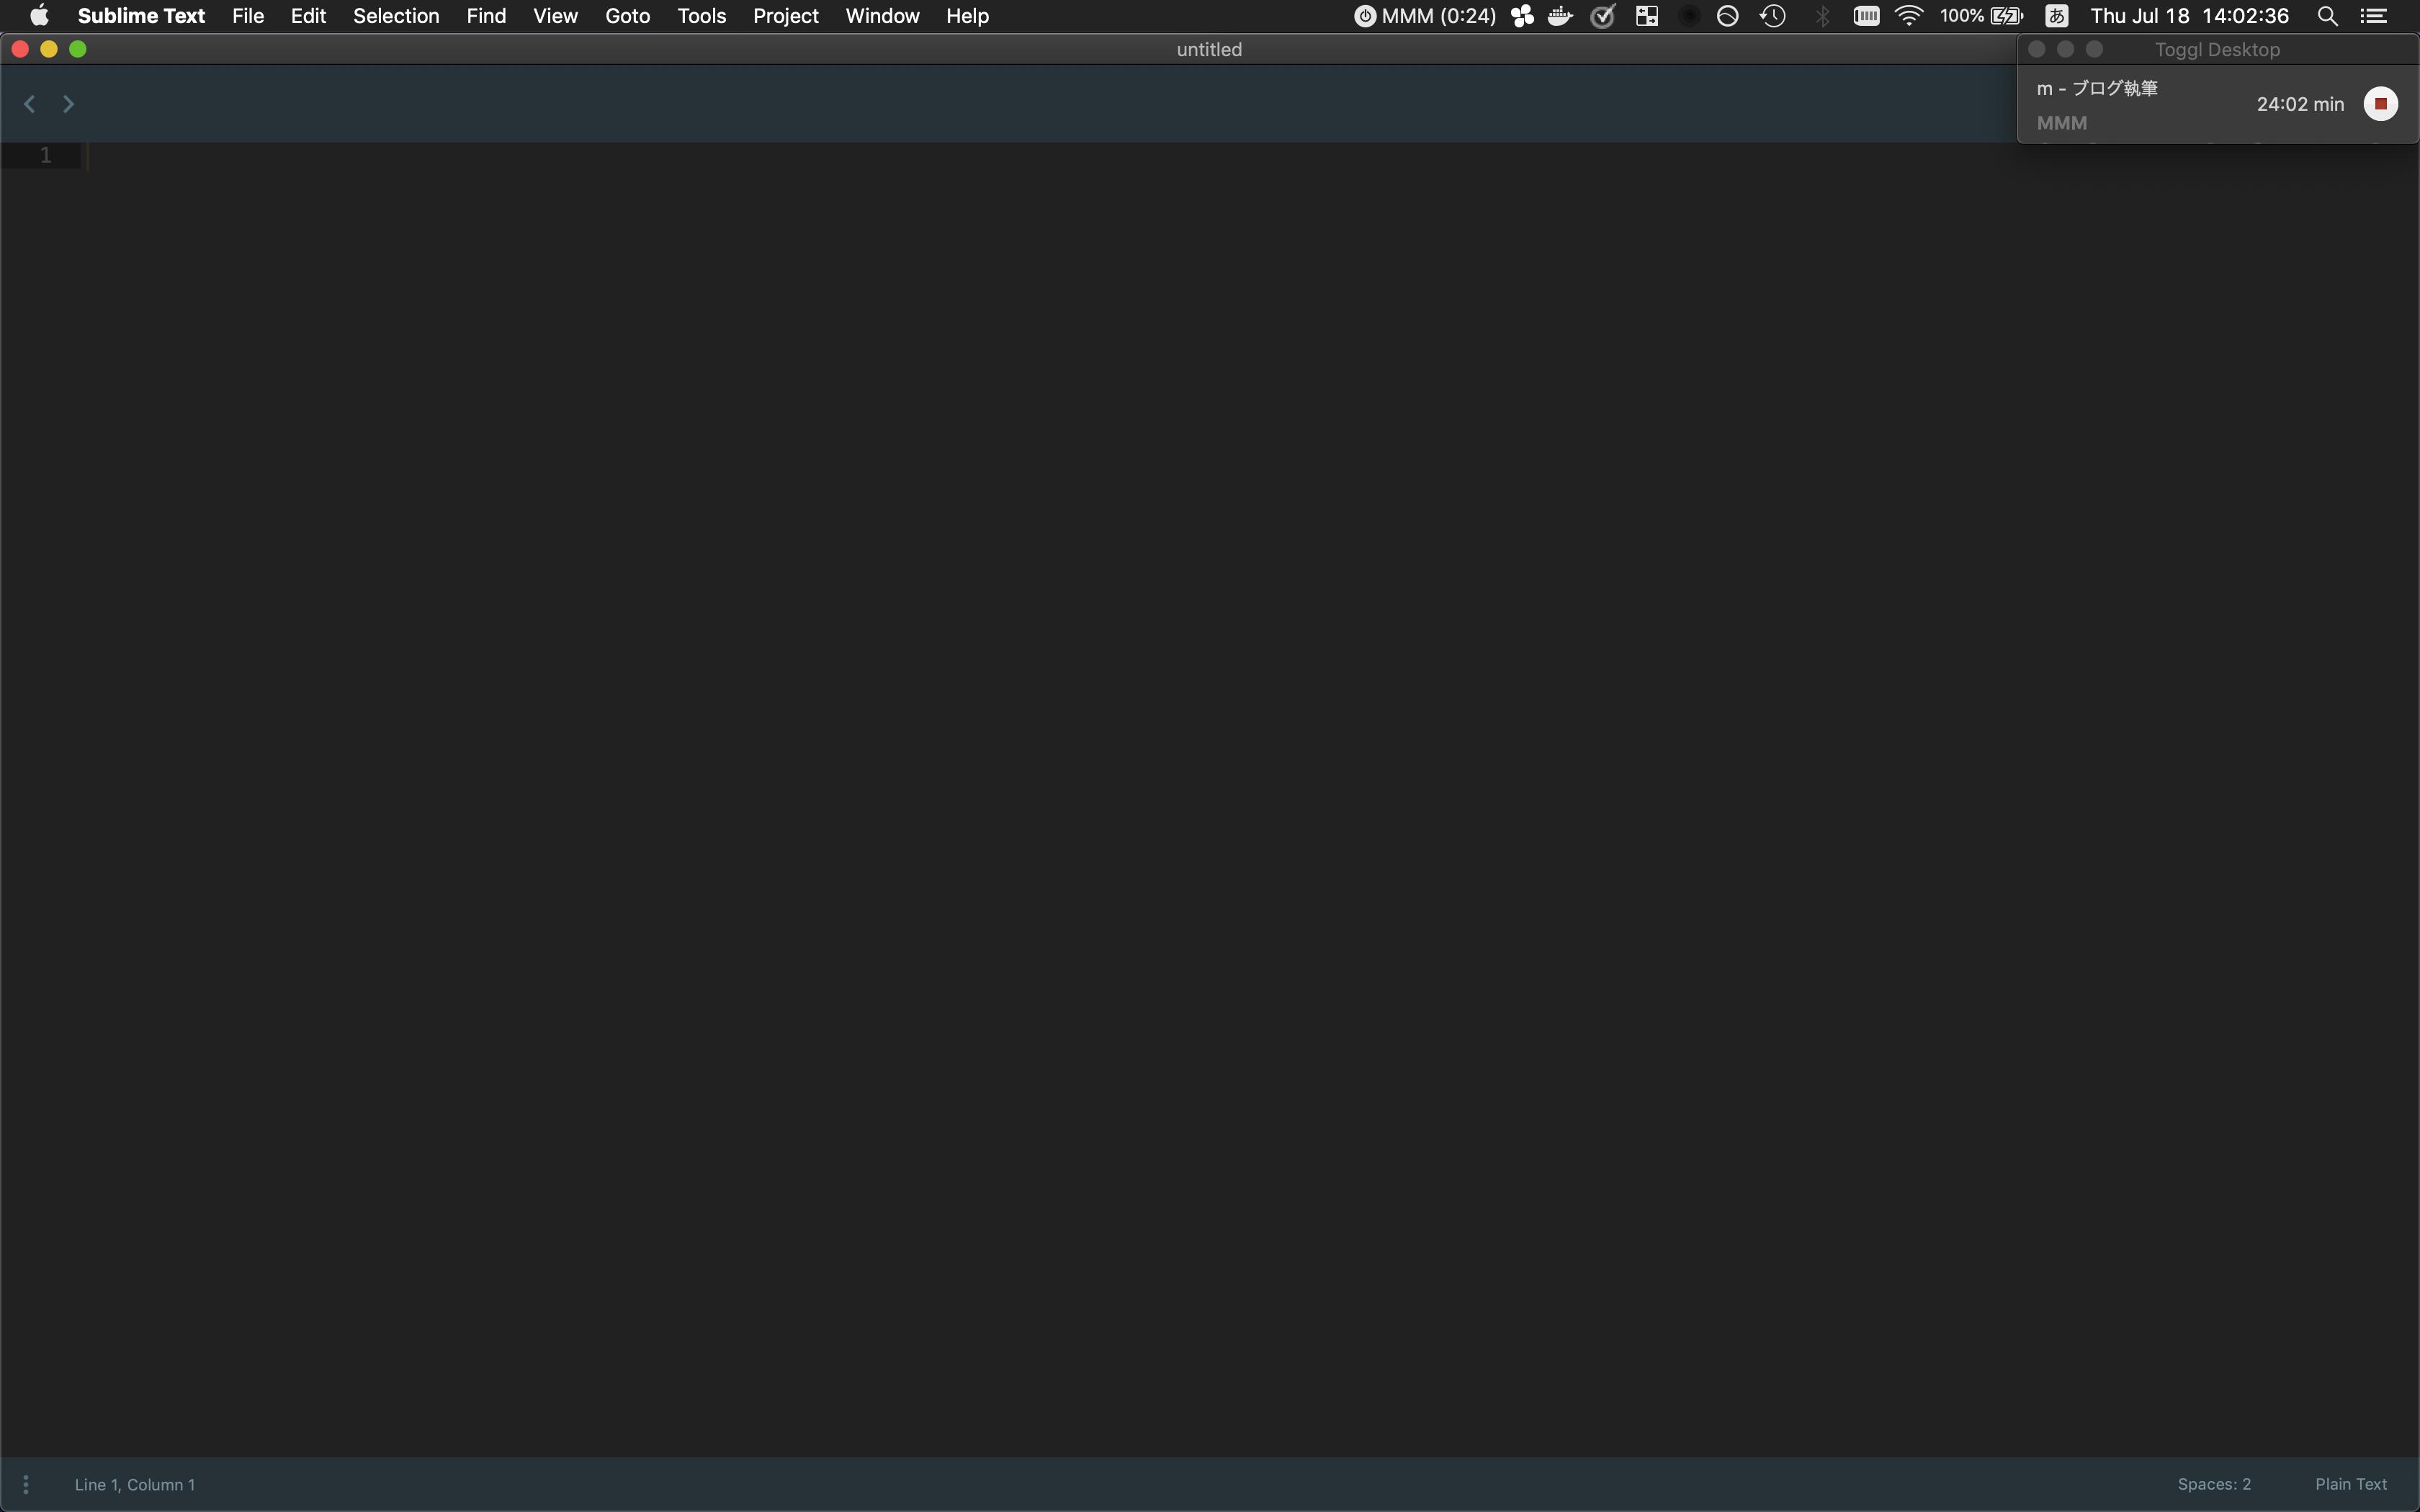 Toggl - Macデスクトップクライアント - 全面/右上固定